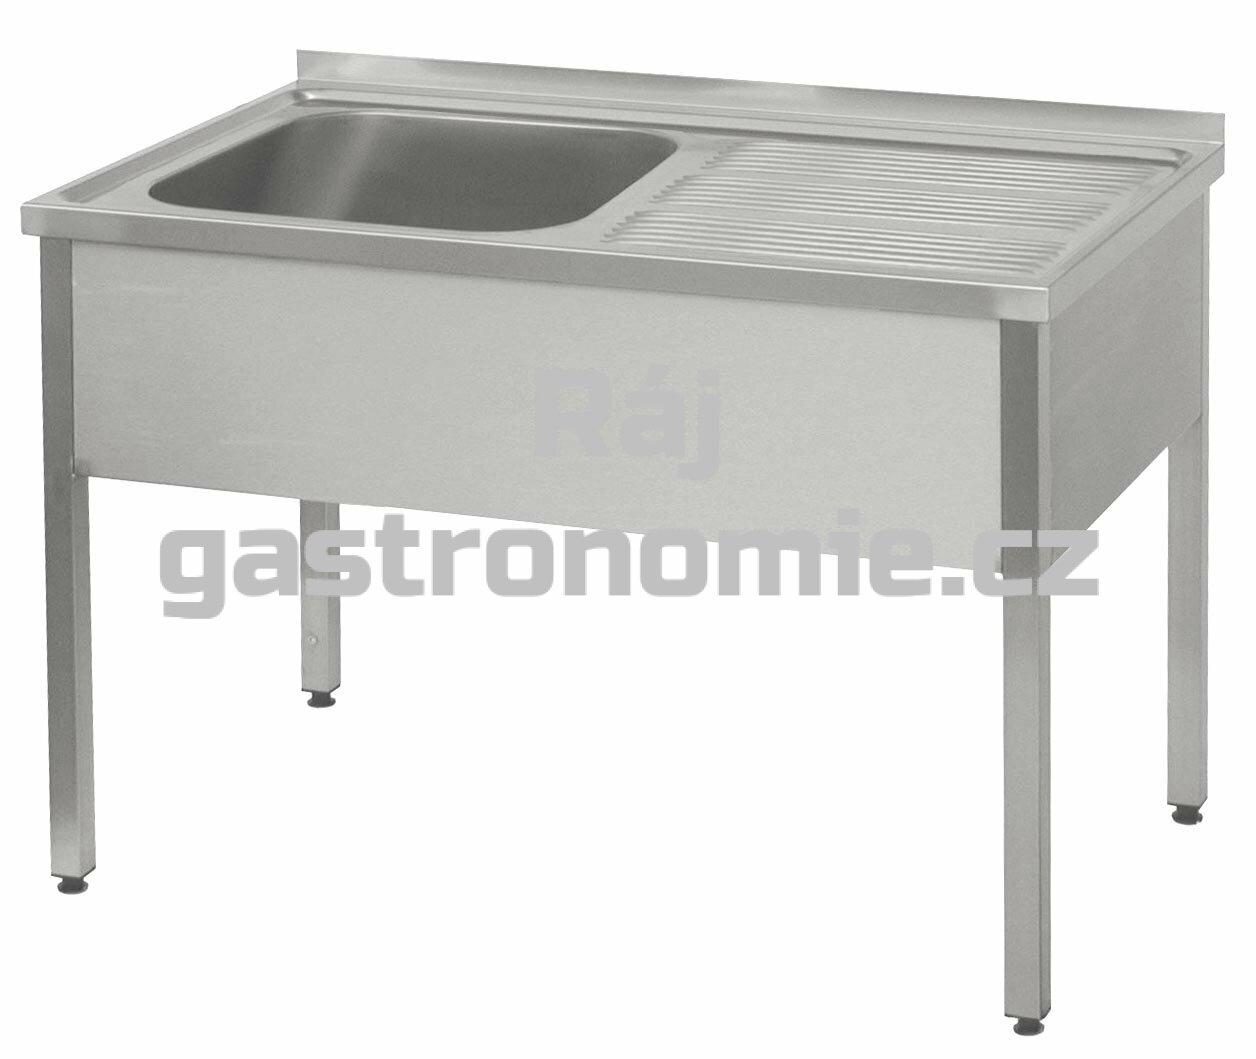 Dřez - 100x60, nádoba 50x50x30 cm